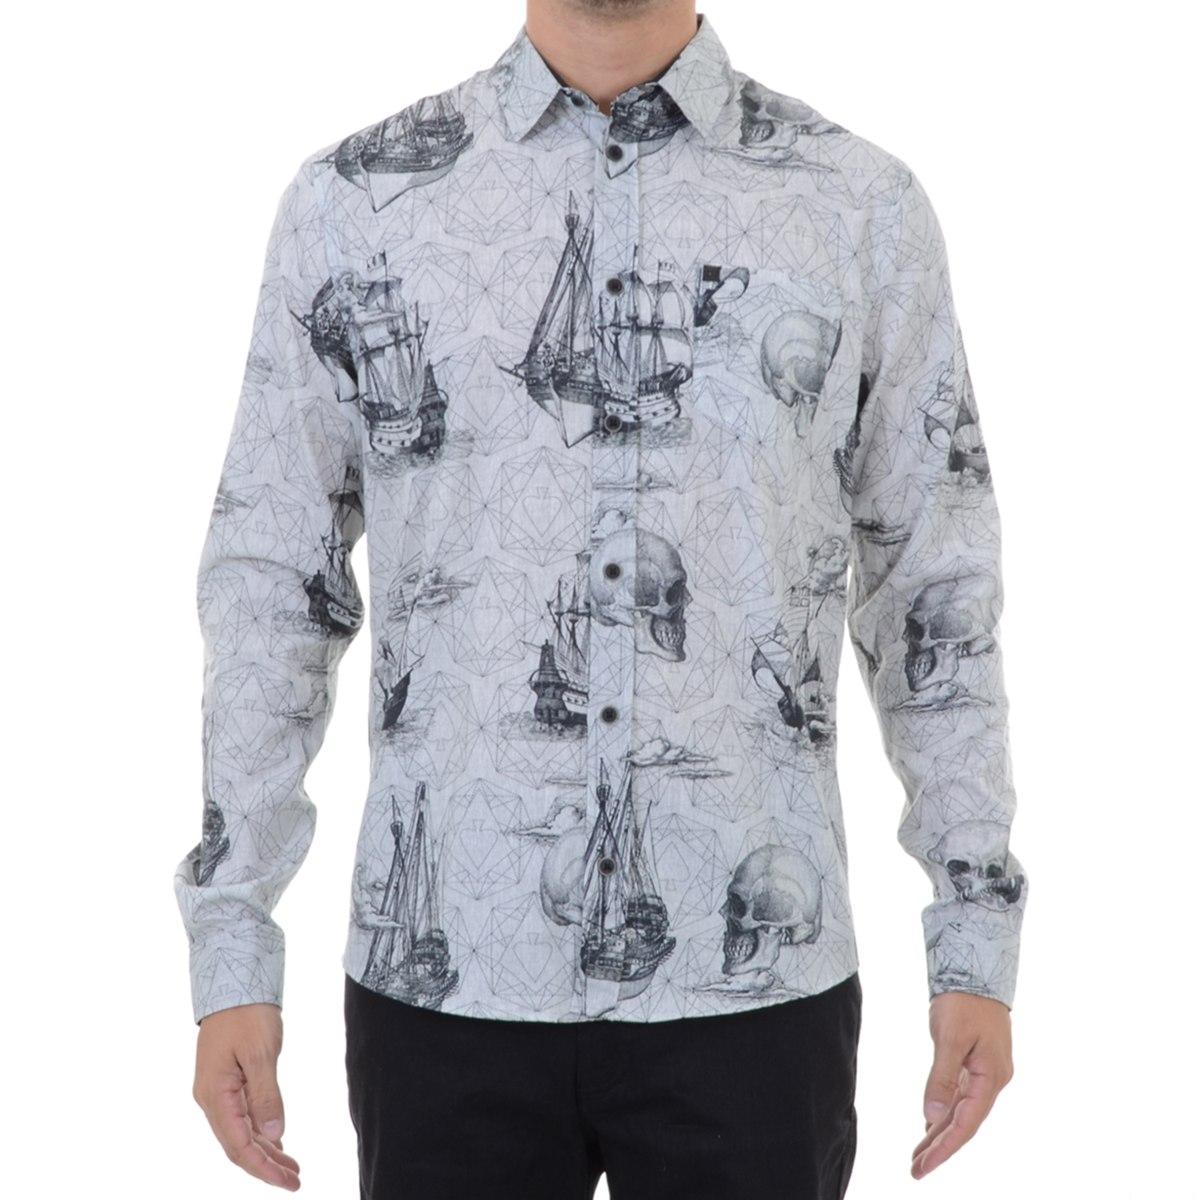 camisa masculina mcd caravelas cinza. Carregando zoom. 21d45c528c9